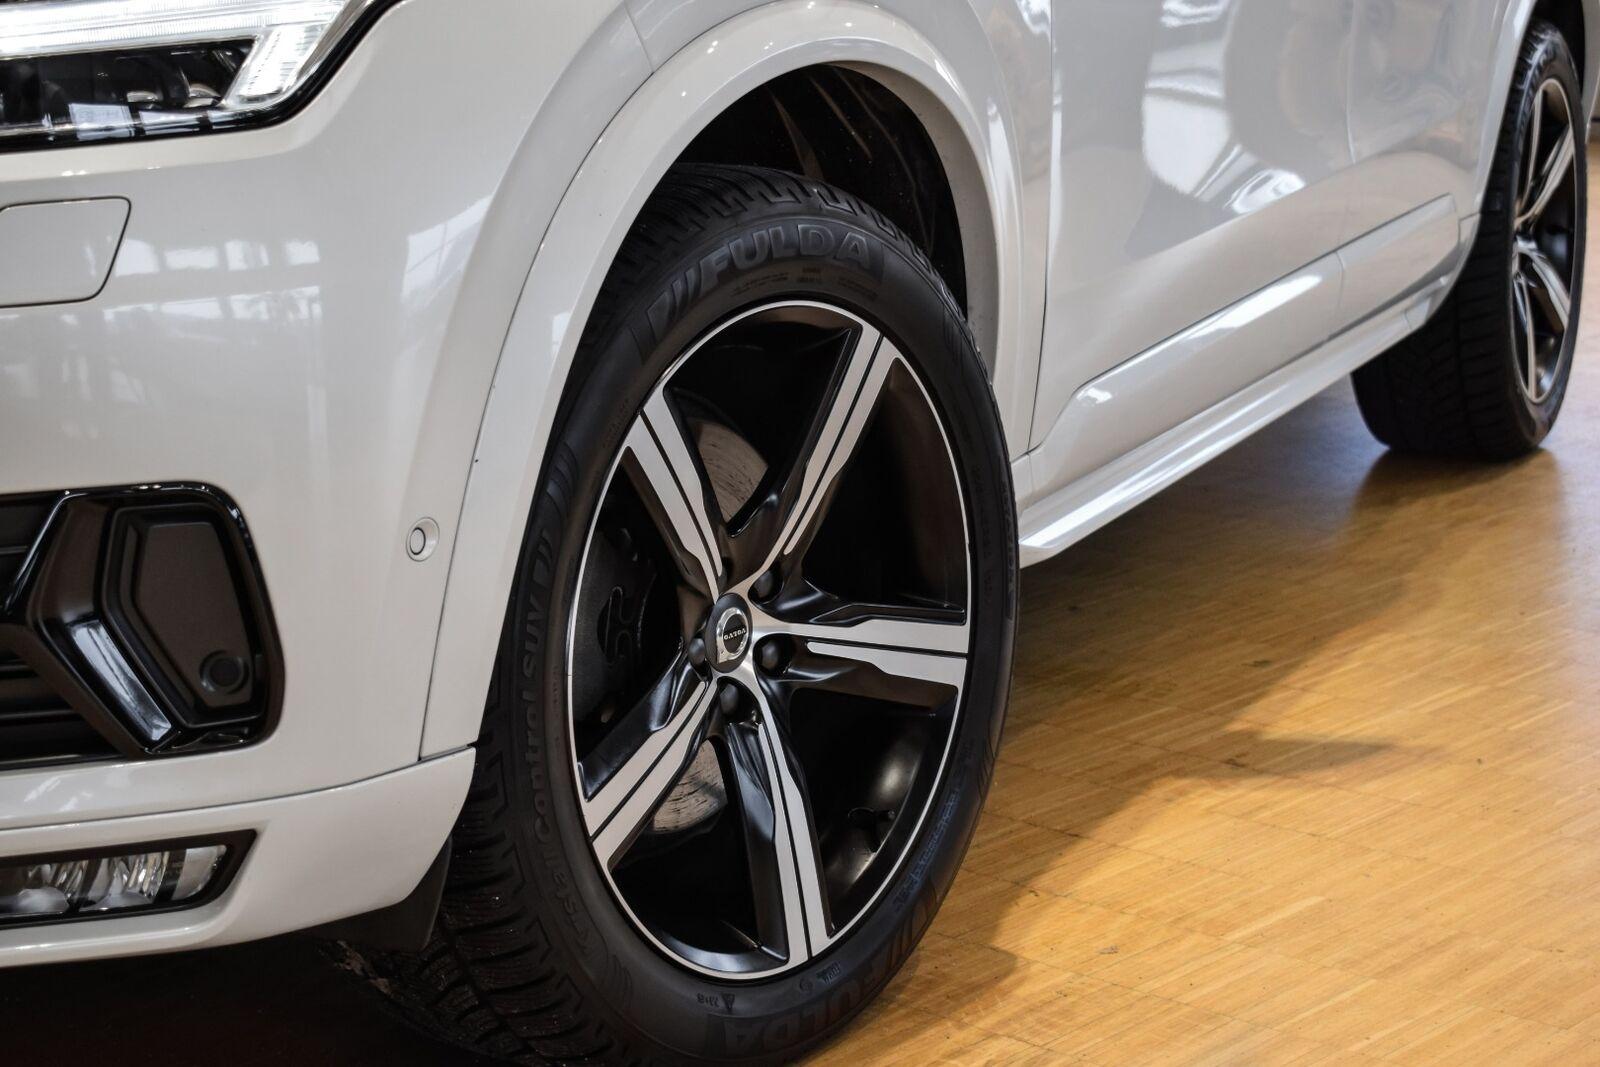 Volvo XC90 2,0 D5 225 R-Design aut. AWD 7prs - billede 4